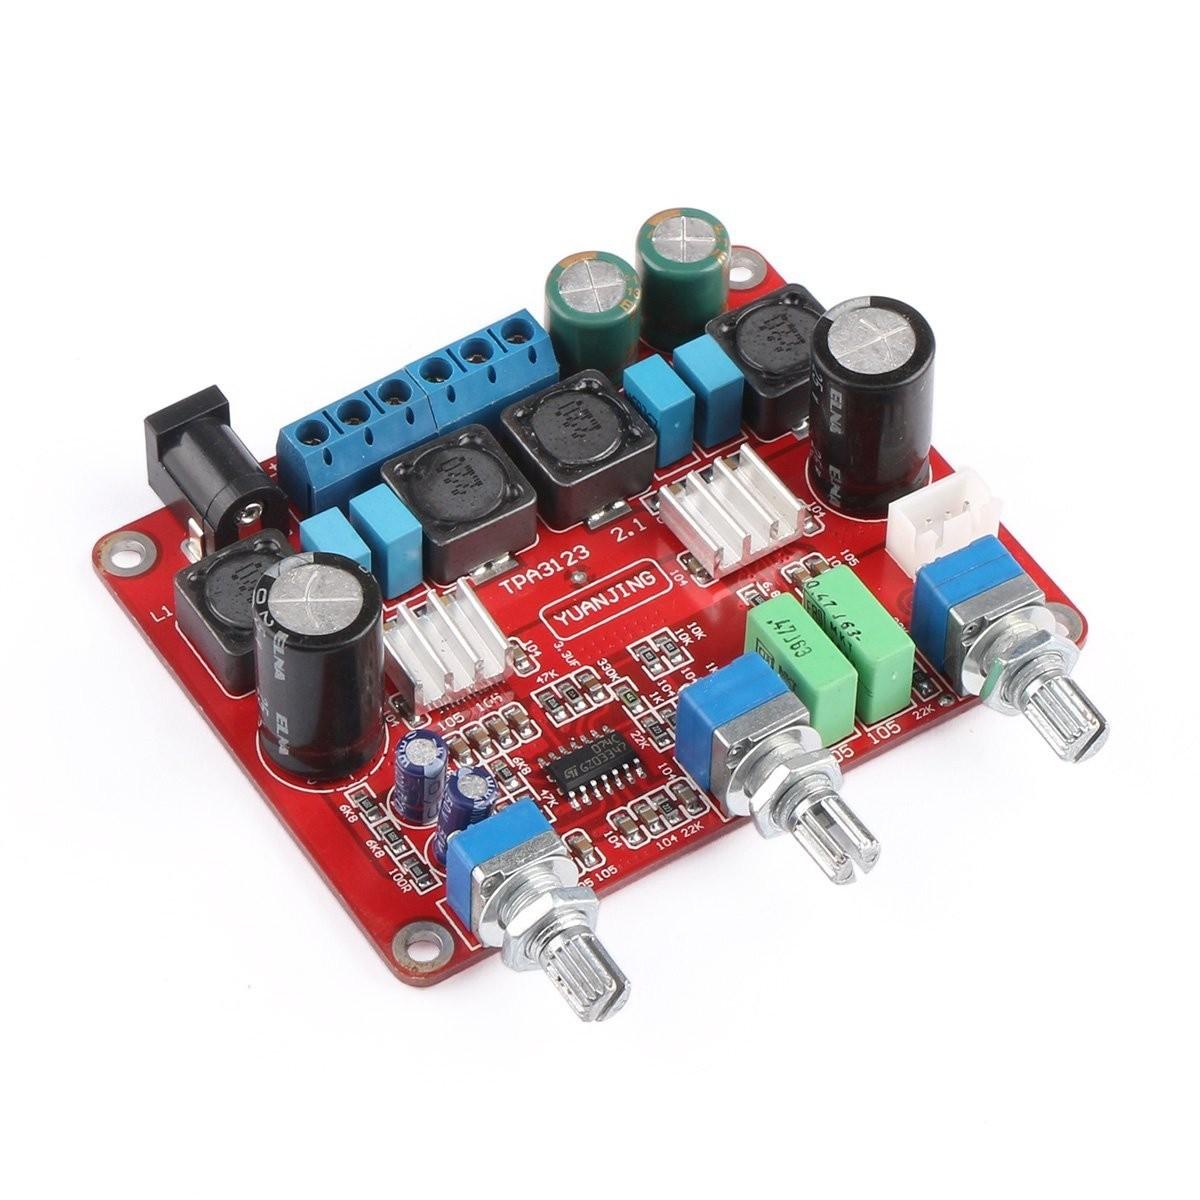 Riorand Tpa3123 Class D Digital Subwoofer Amplifier 21 Channel Amp Zoom